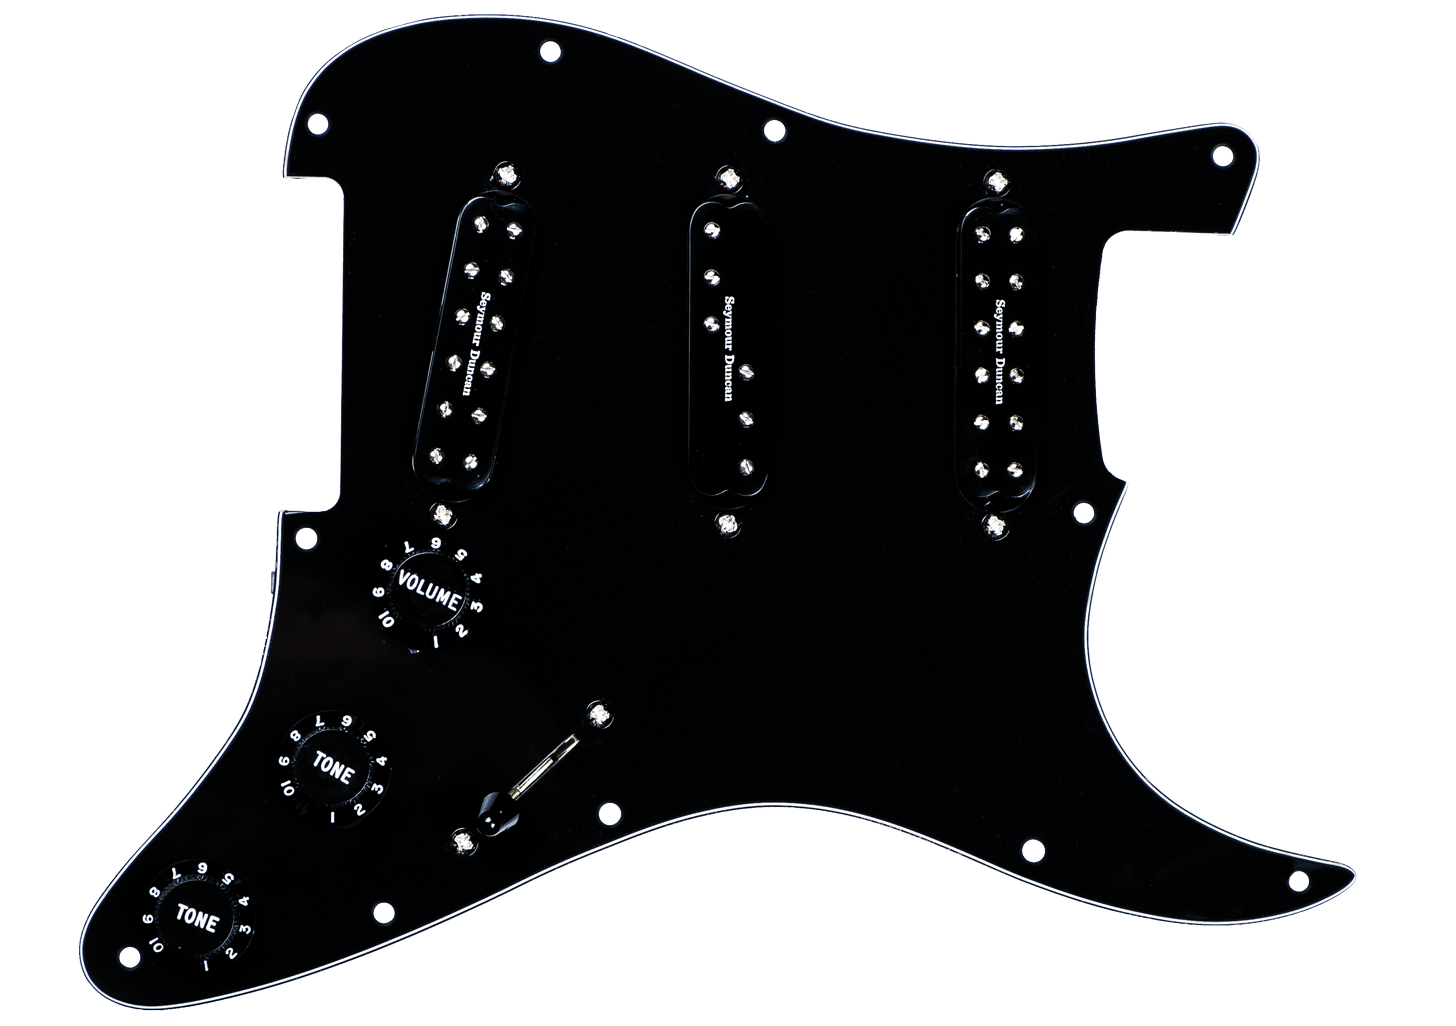 Versatile Stratocaster Pickguard